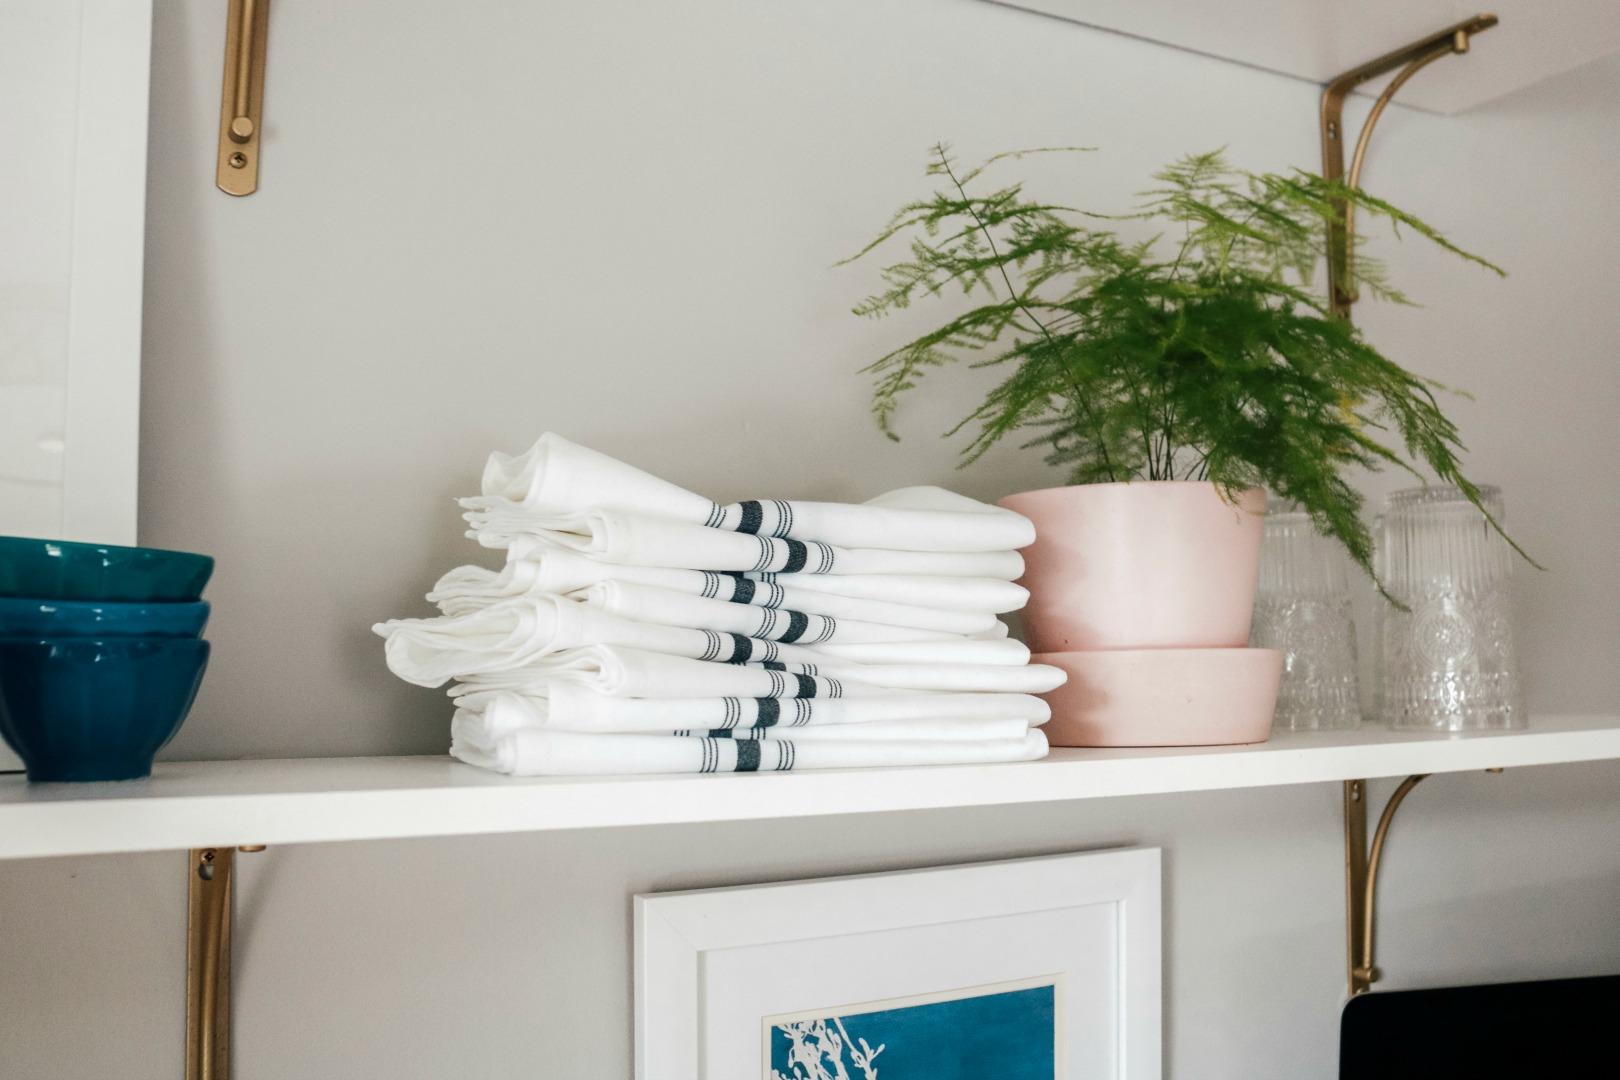 Kitchen Shelf Styling- Kitchen Shelves- Dining Room Styling Dining Room Shelves